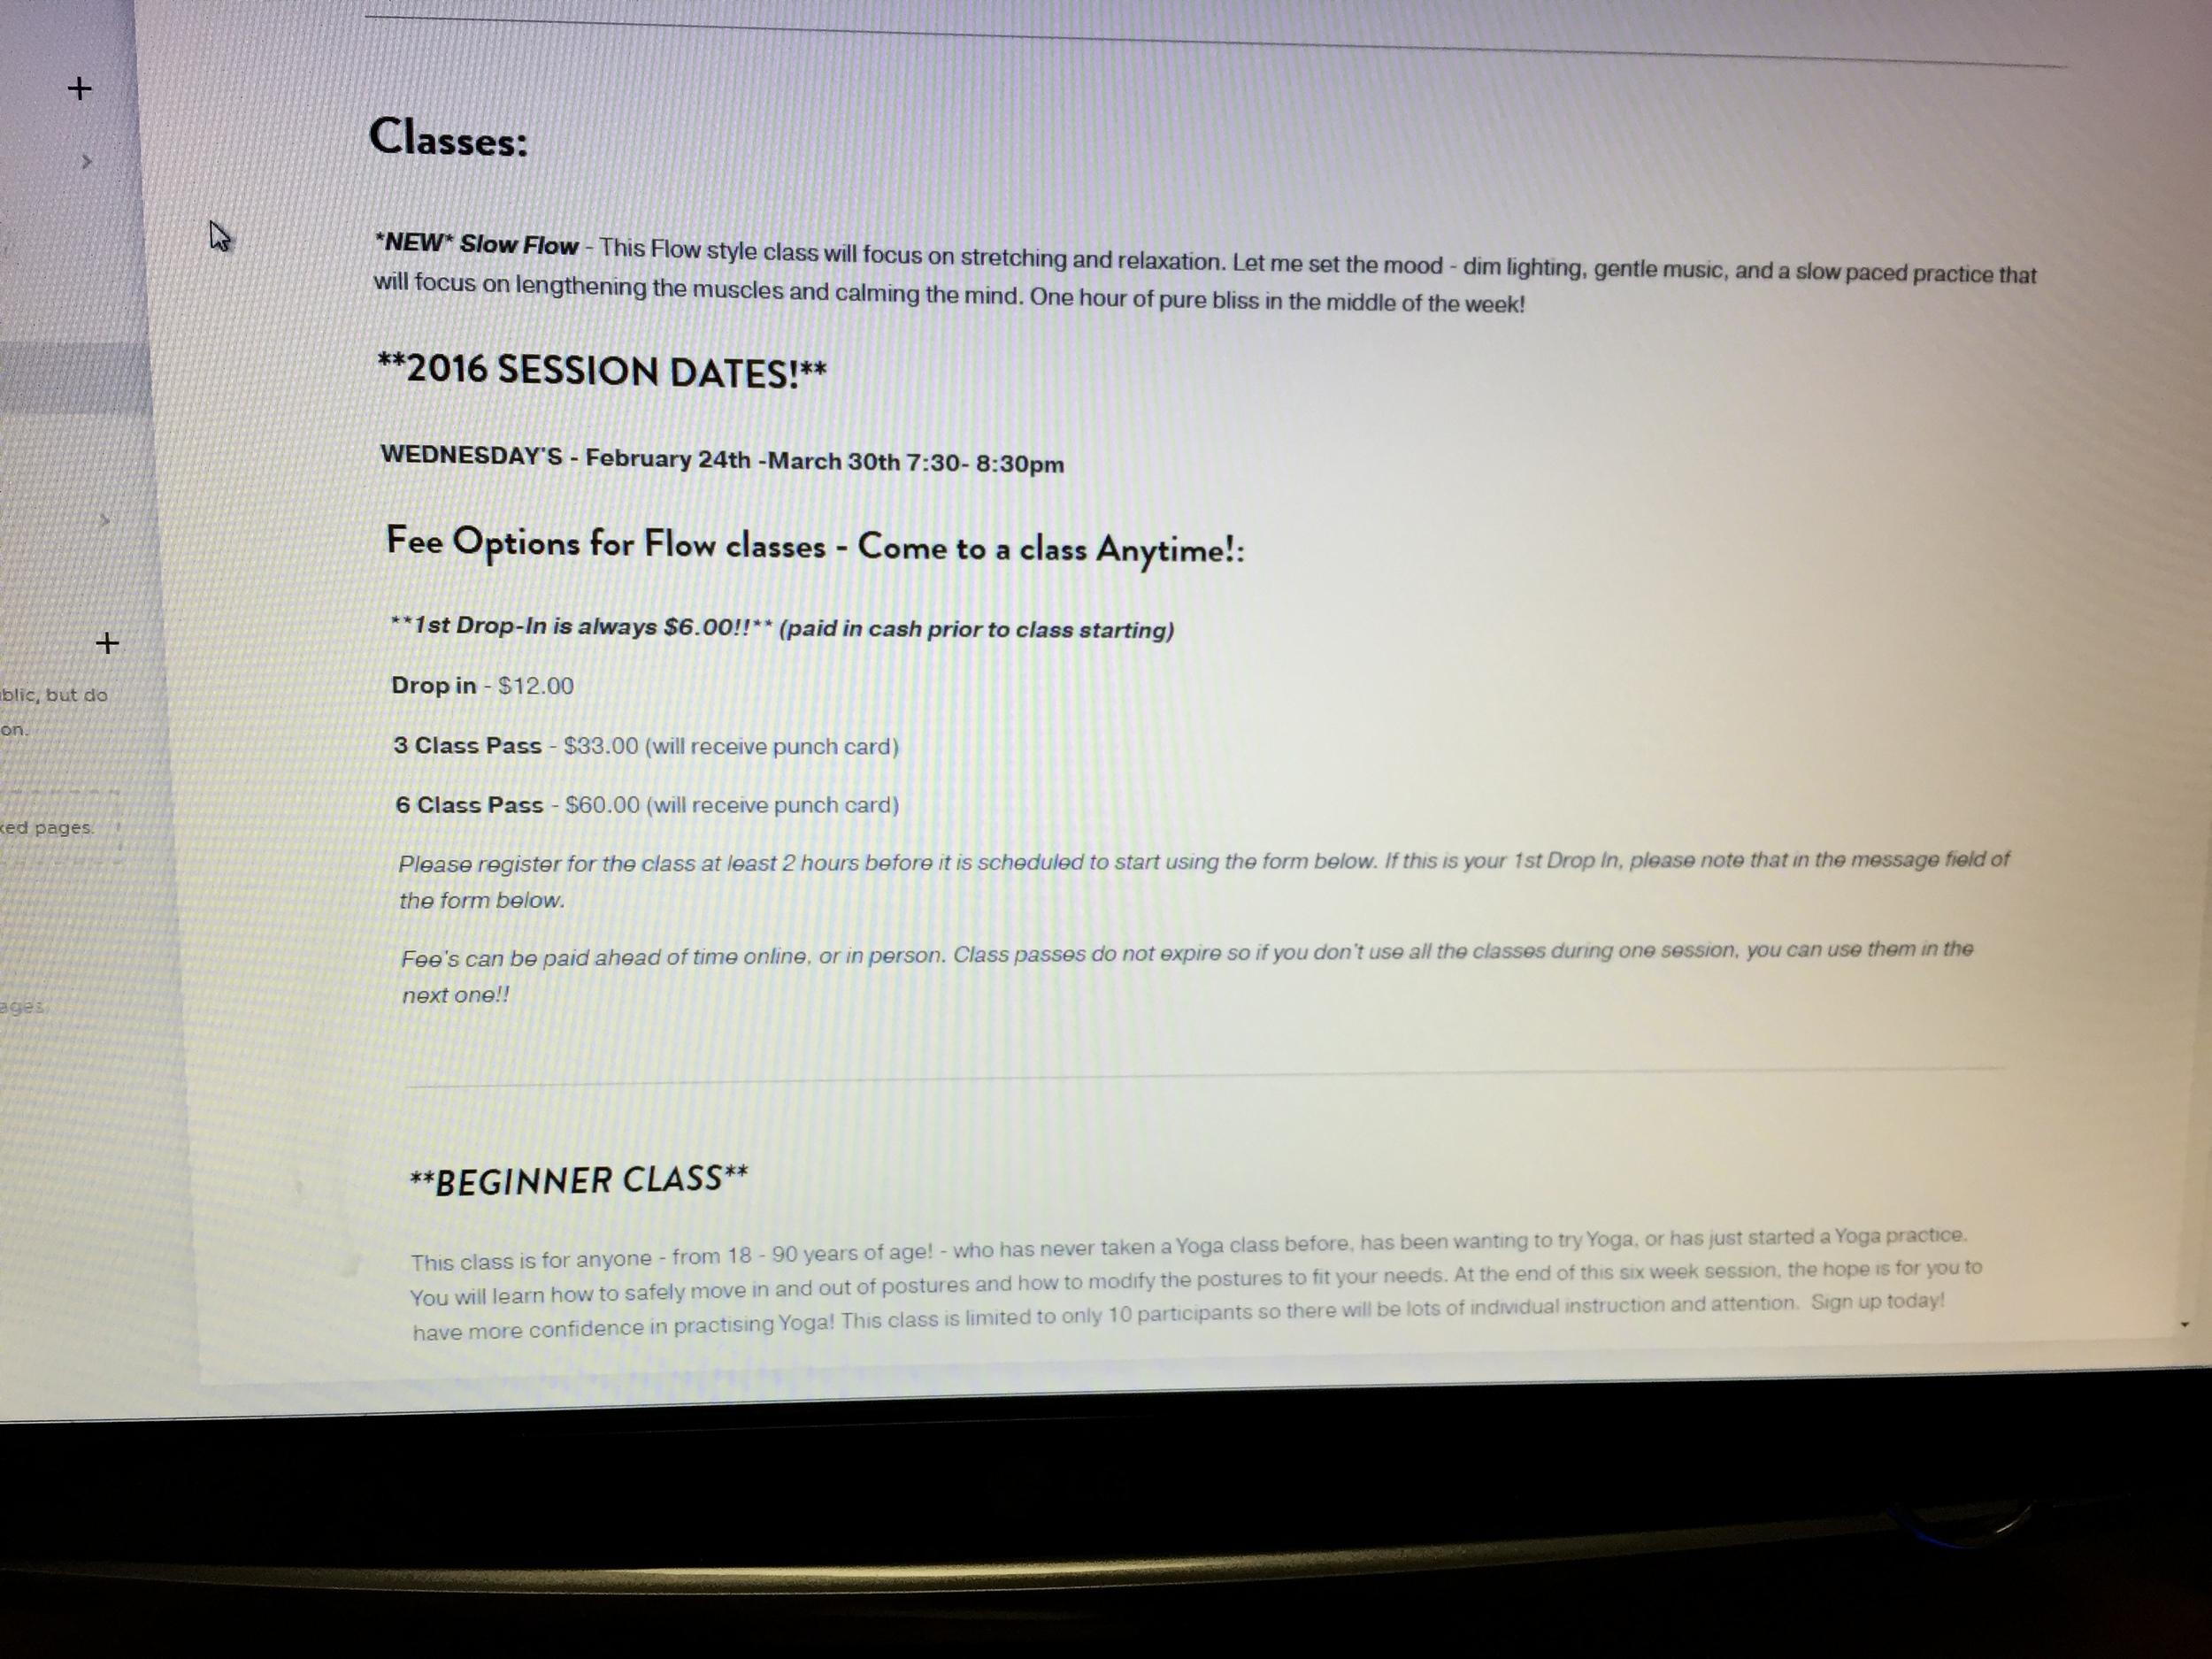 Writing class descriptions for the website